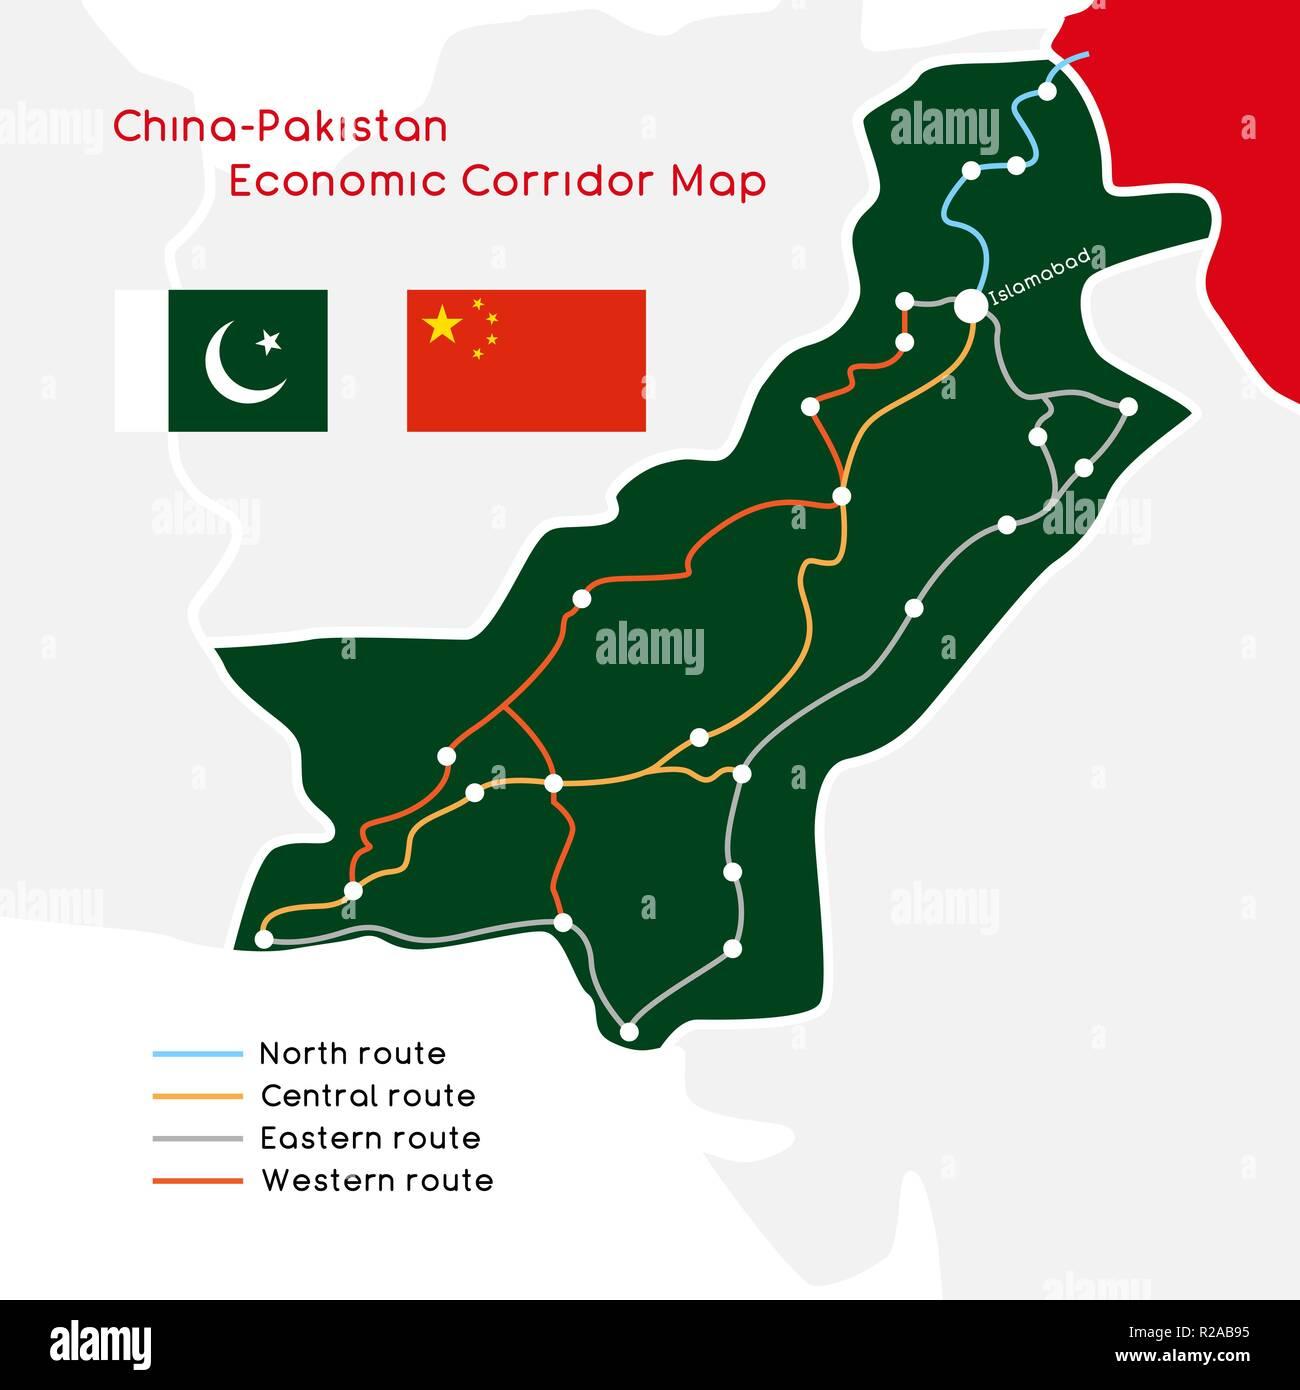 One Belt One Road new Silk Road concept. China - Pakistan Economic Corridor. Vector illustration. - Stock Image